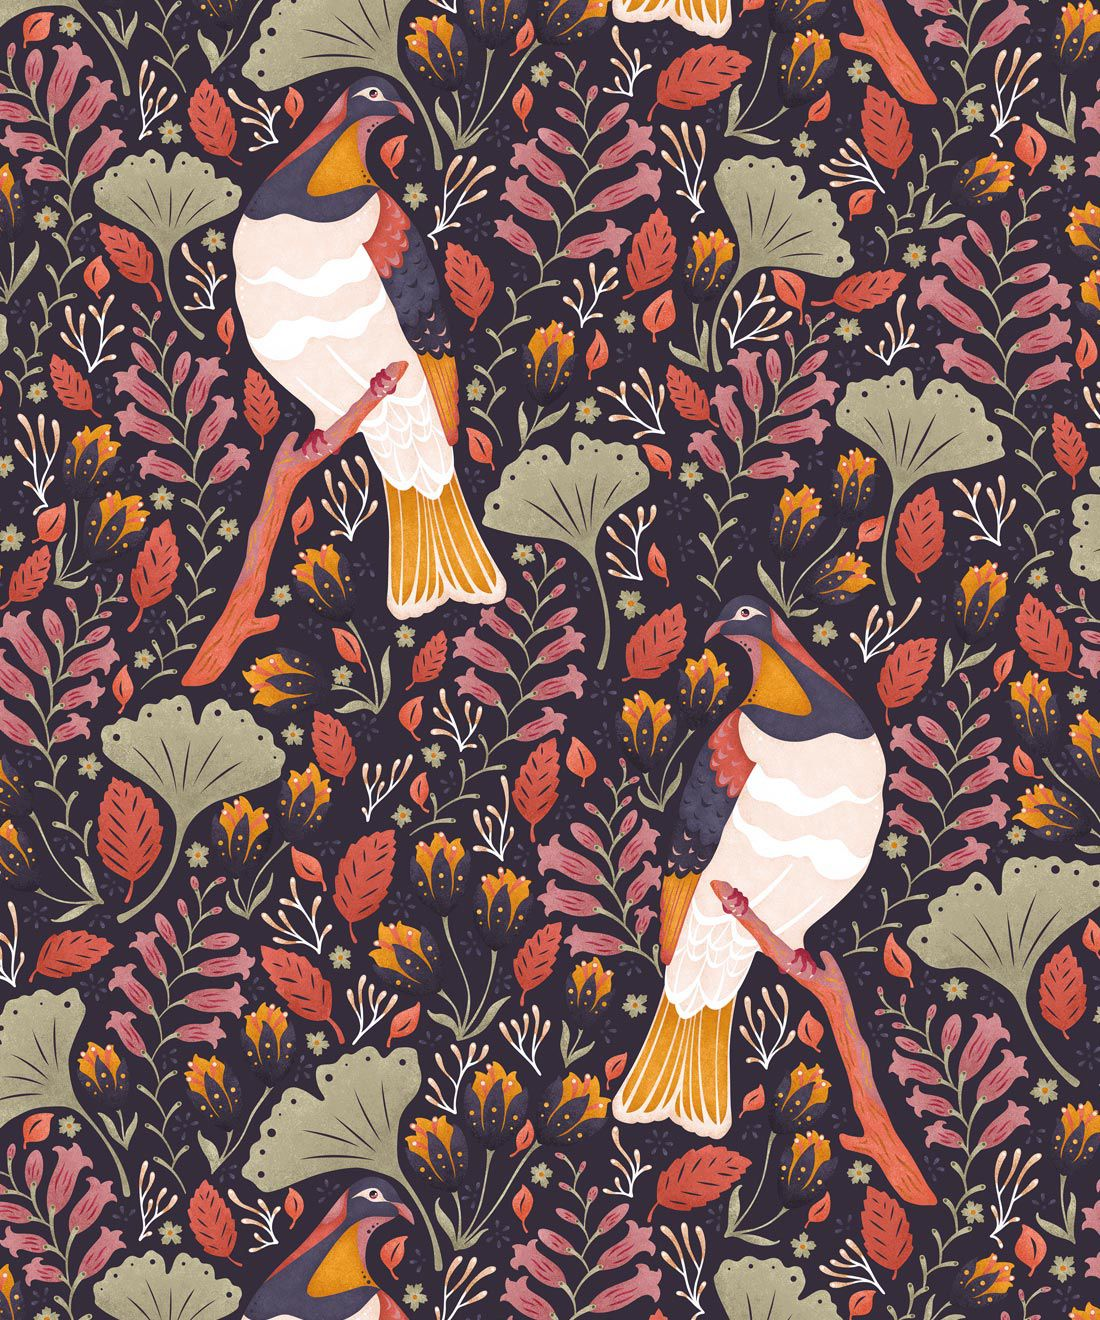 Kereru Wallpaper • Wood Pigeon• Bird Wallpaper • Orange Wallpaper • Midnight